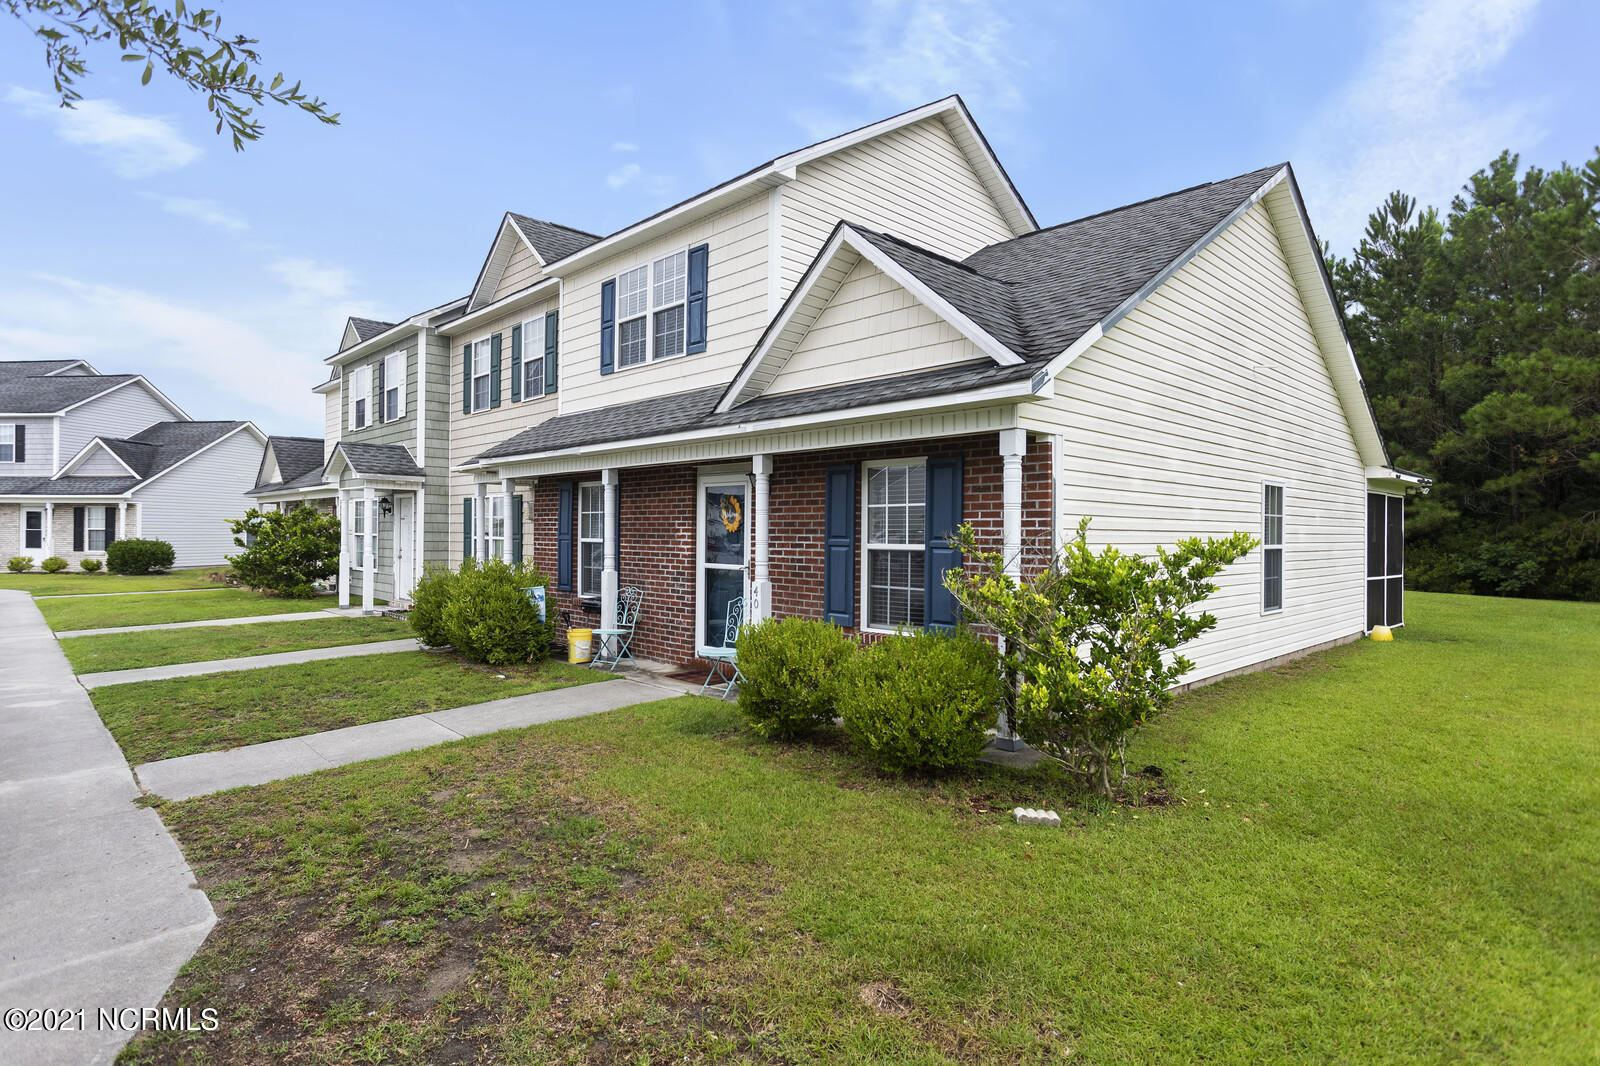 Photo of 400 Springwood Drive, Jacksonville, NC 28546 (MLS # 100284488)